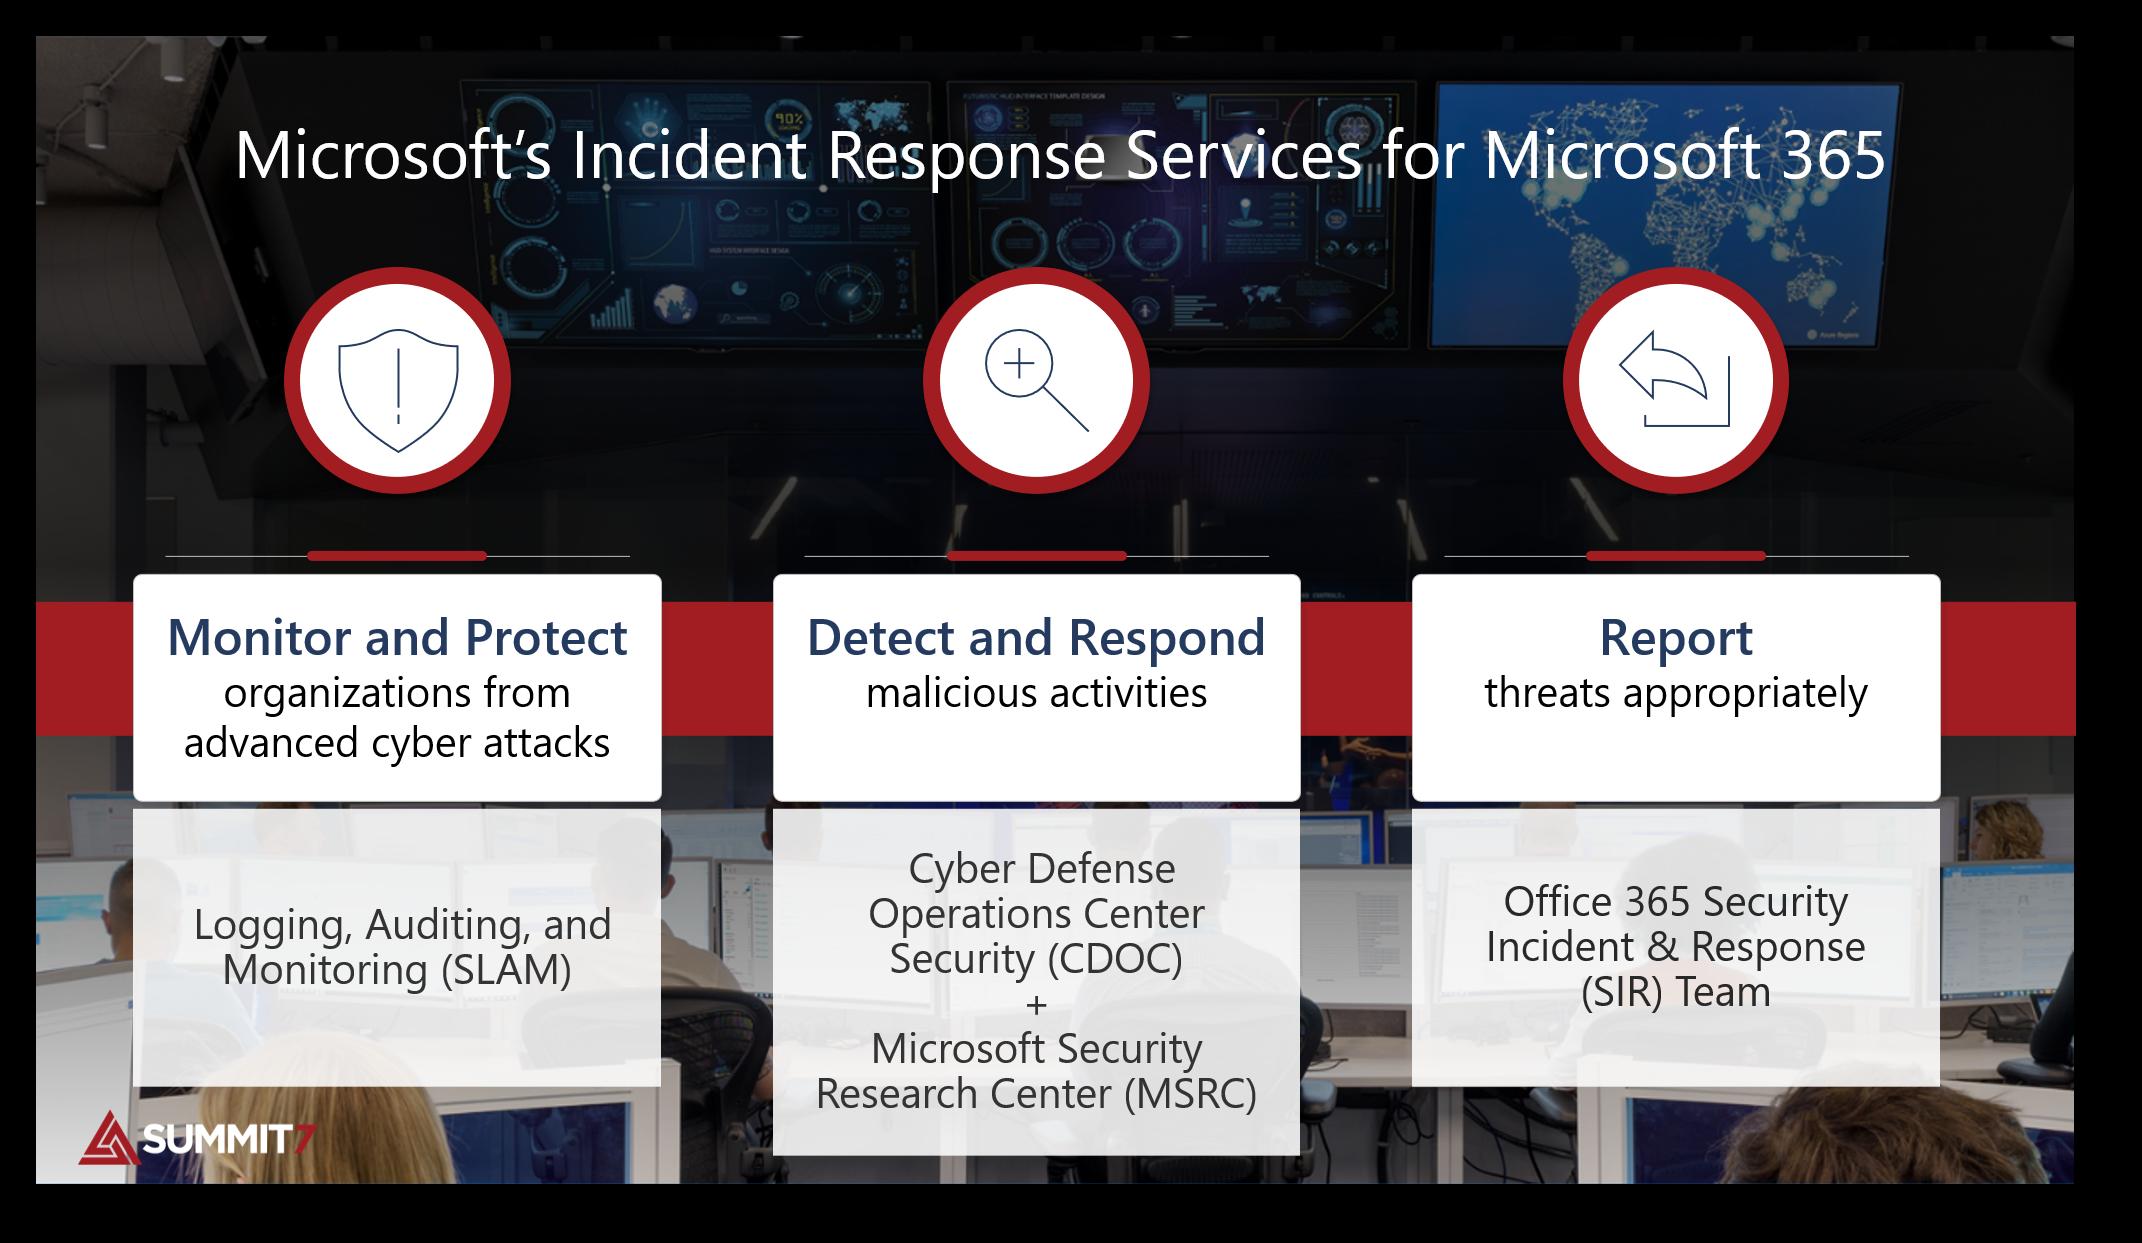 Incident Response Microsoft 365 GCC and GCC High